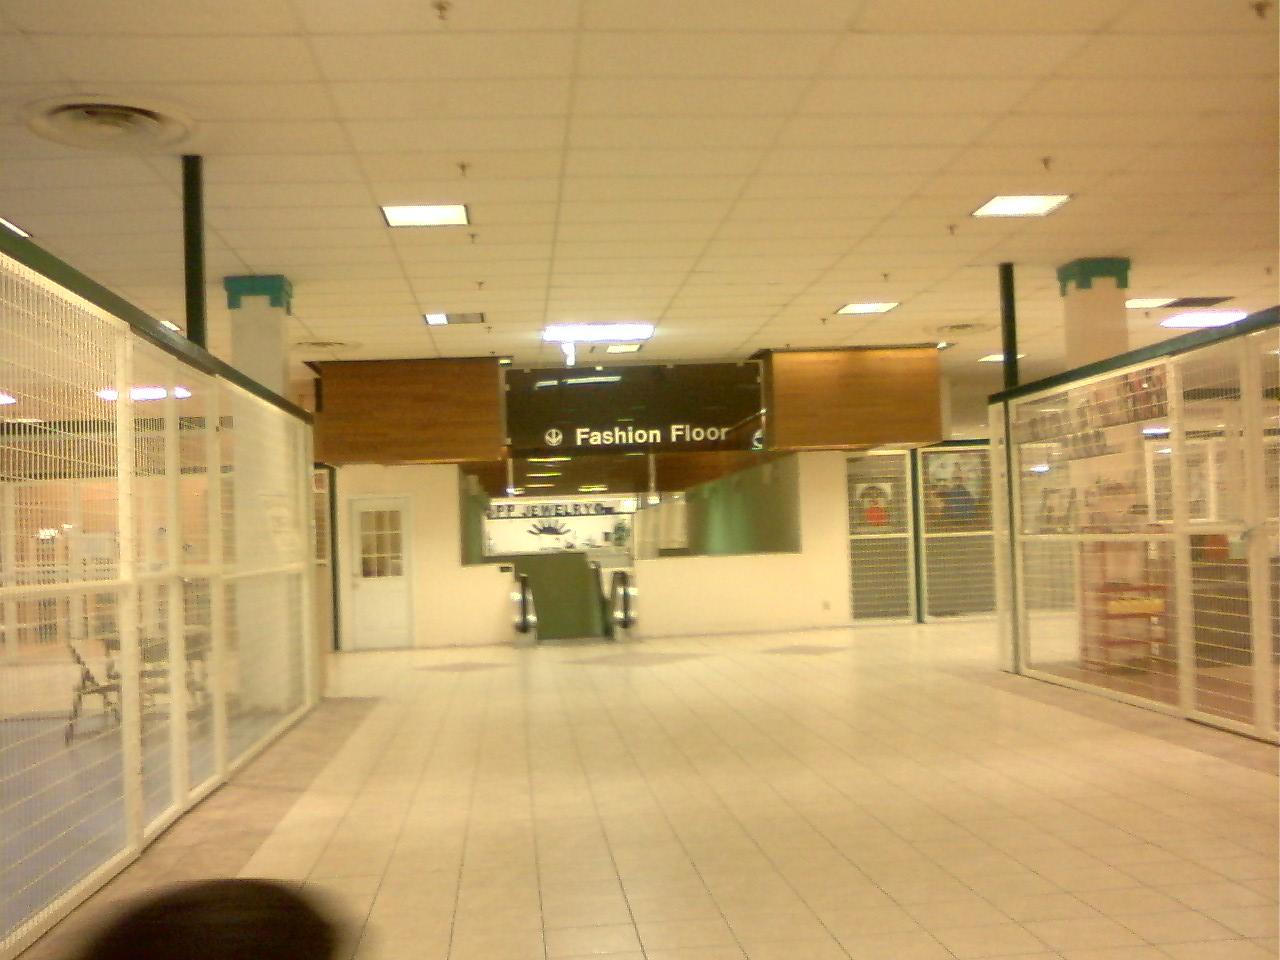 The Louisiana And Texas Retail Blogspot: Now Open